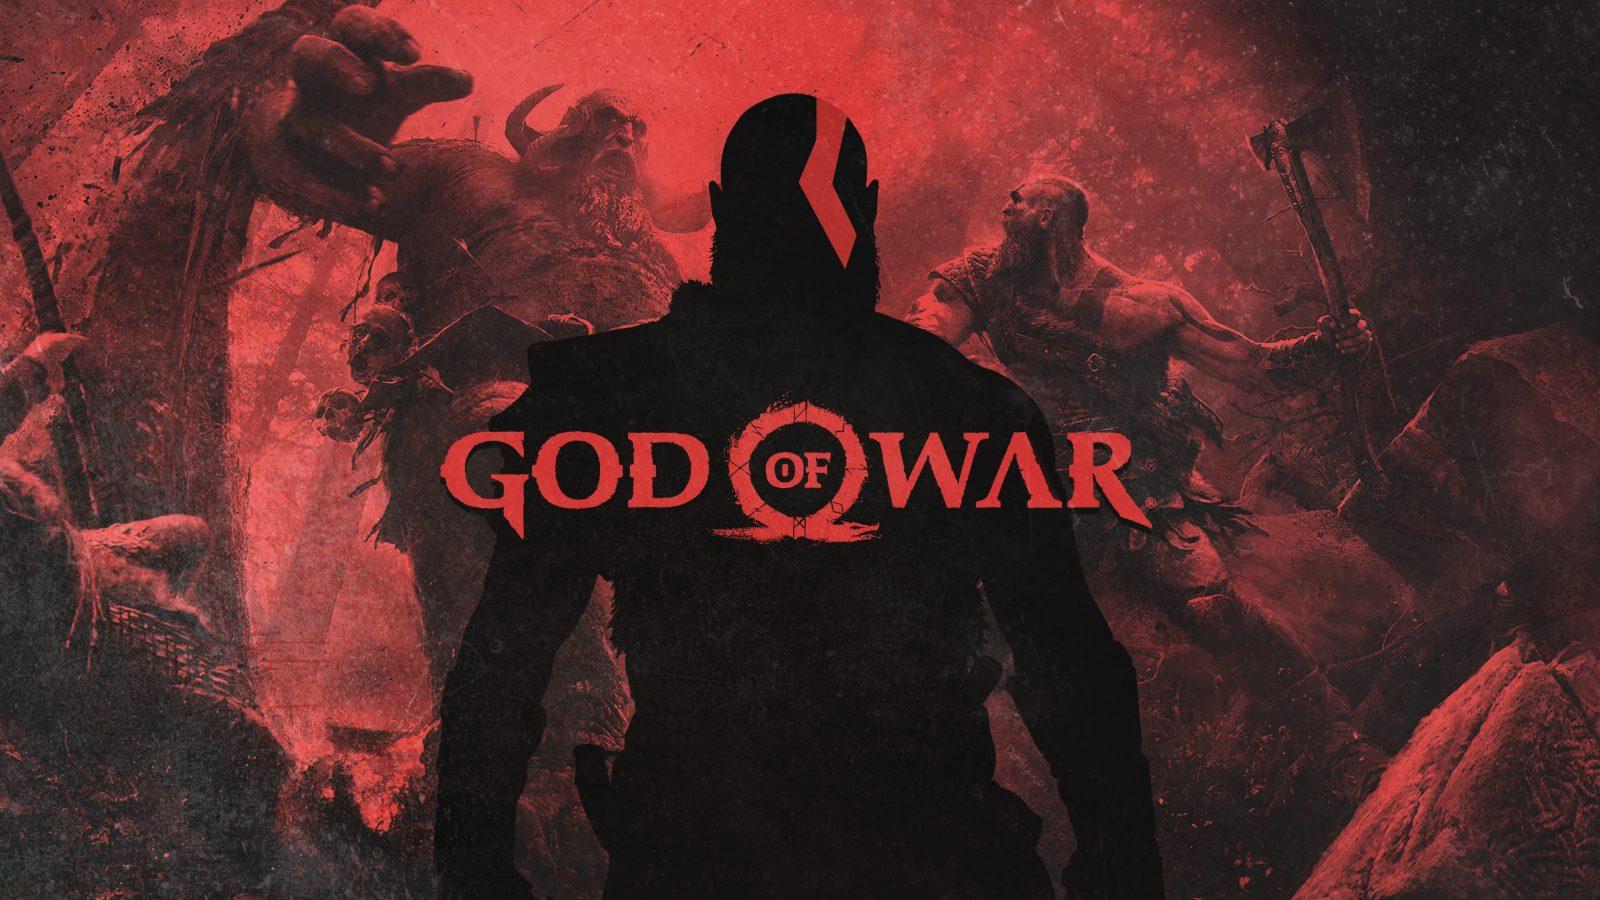 God of War Kratos 4K Wallpaper - Best Wallpapers